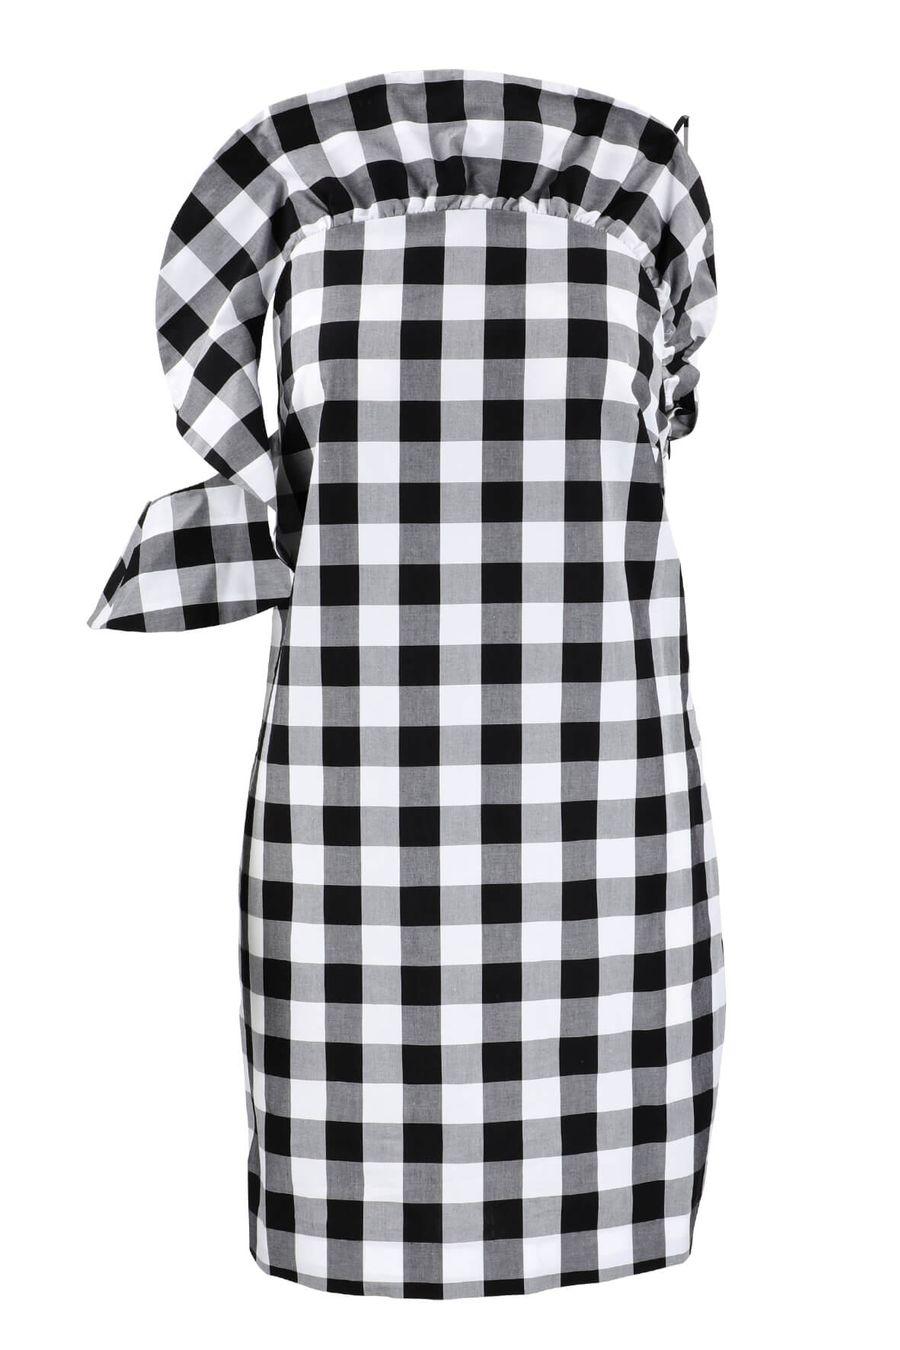 kitri-alison-gingham-mini-dress-1